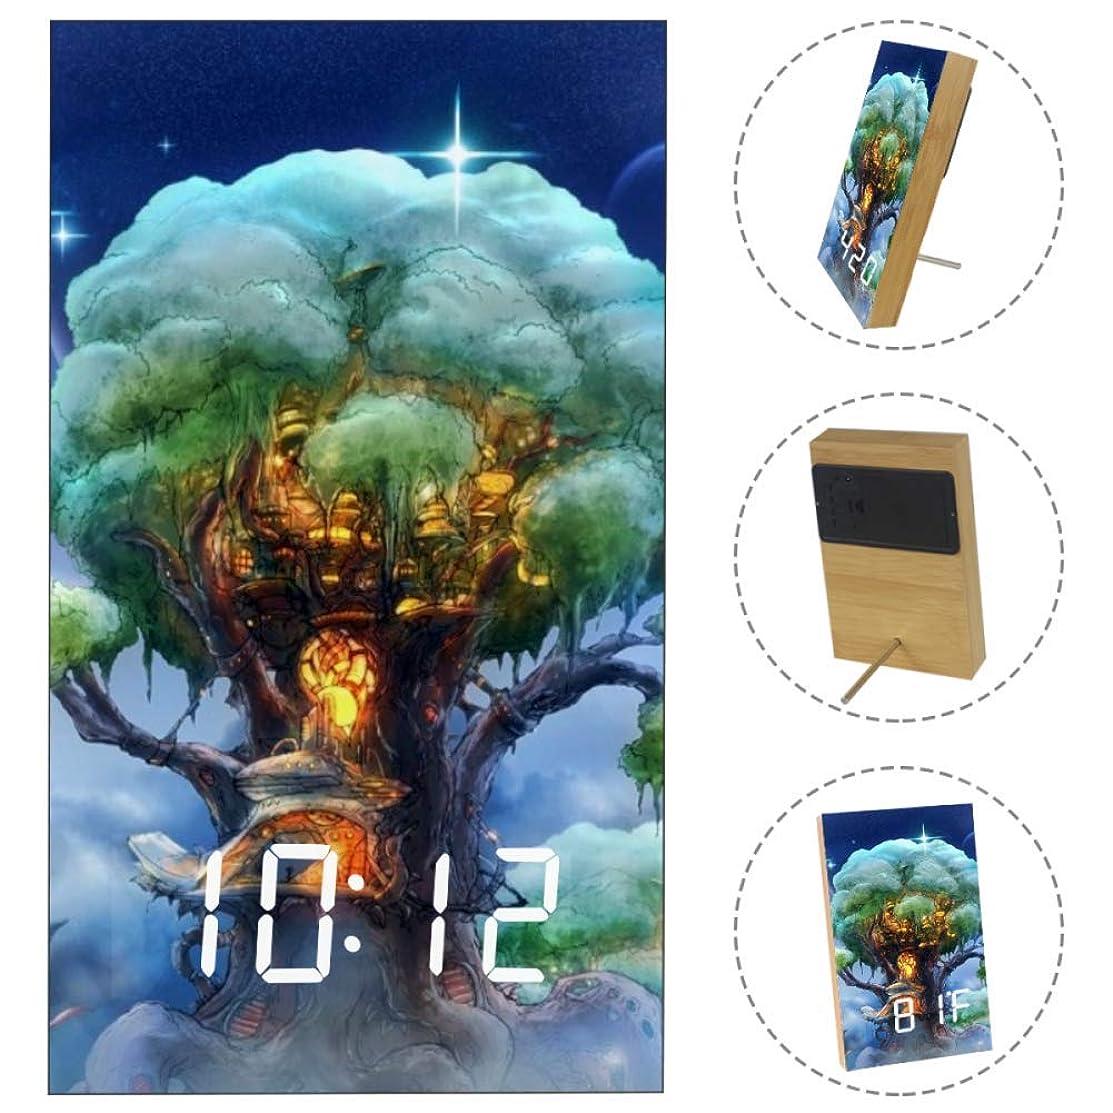 Magic Tree Wood LED Light Alarm Clock Battery Power Supply for Bedroom, Office